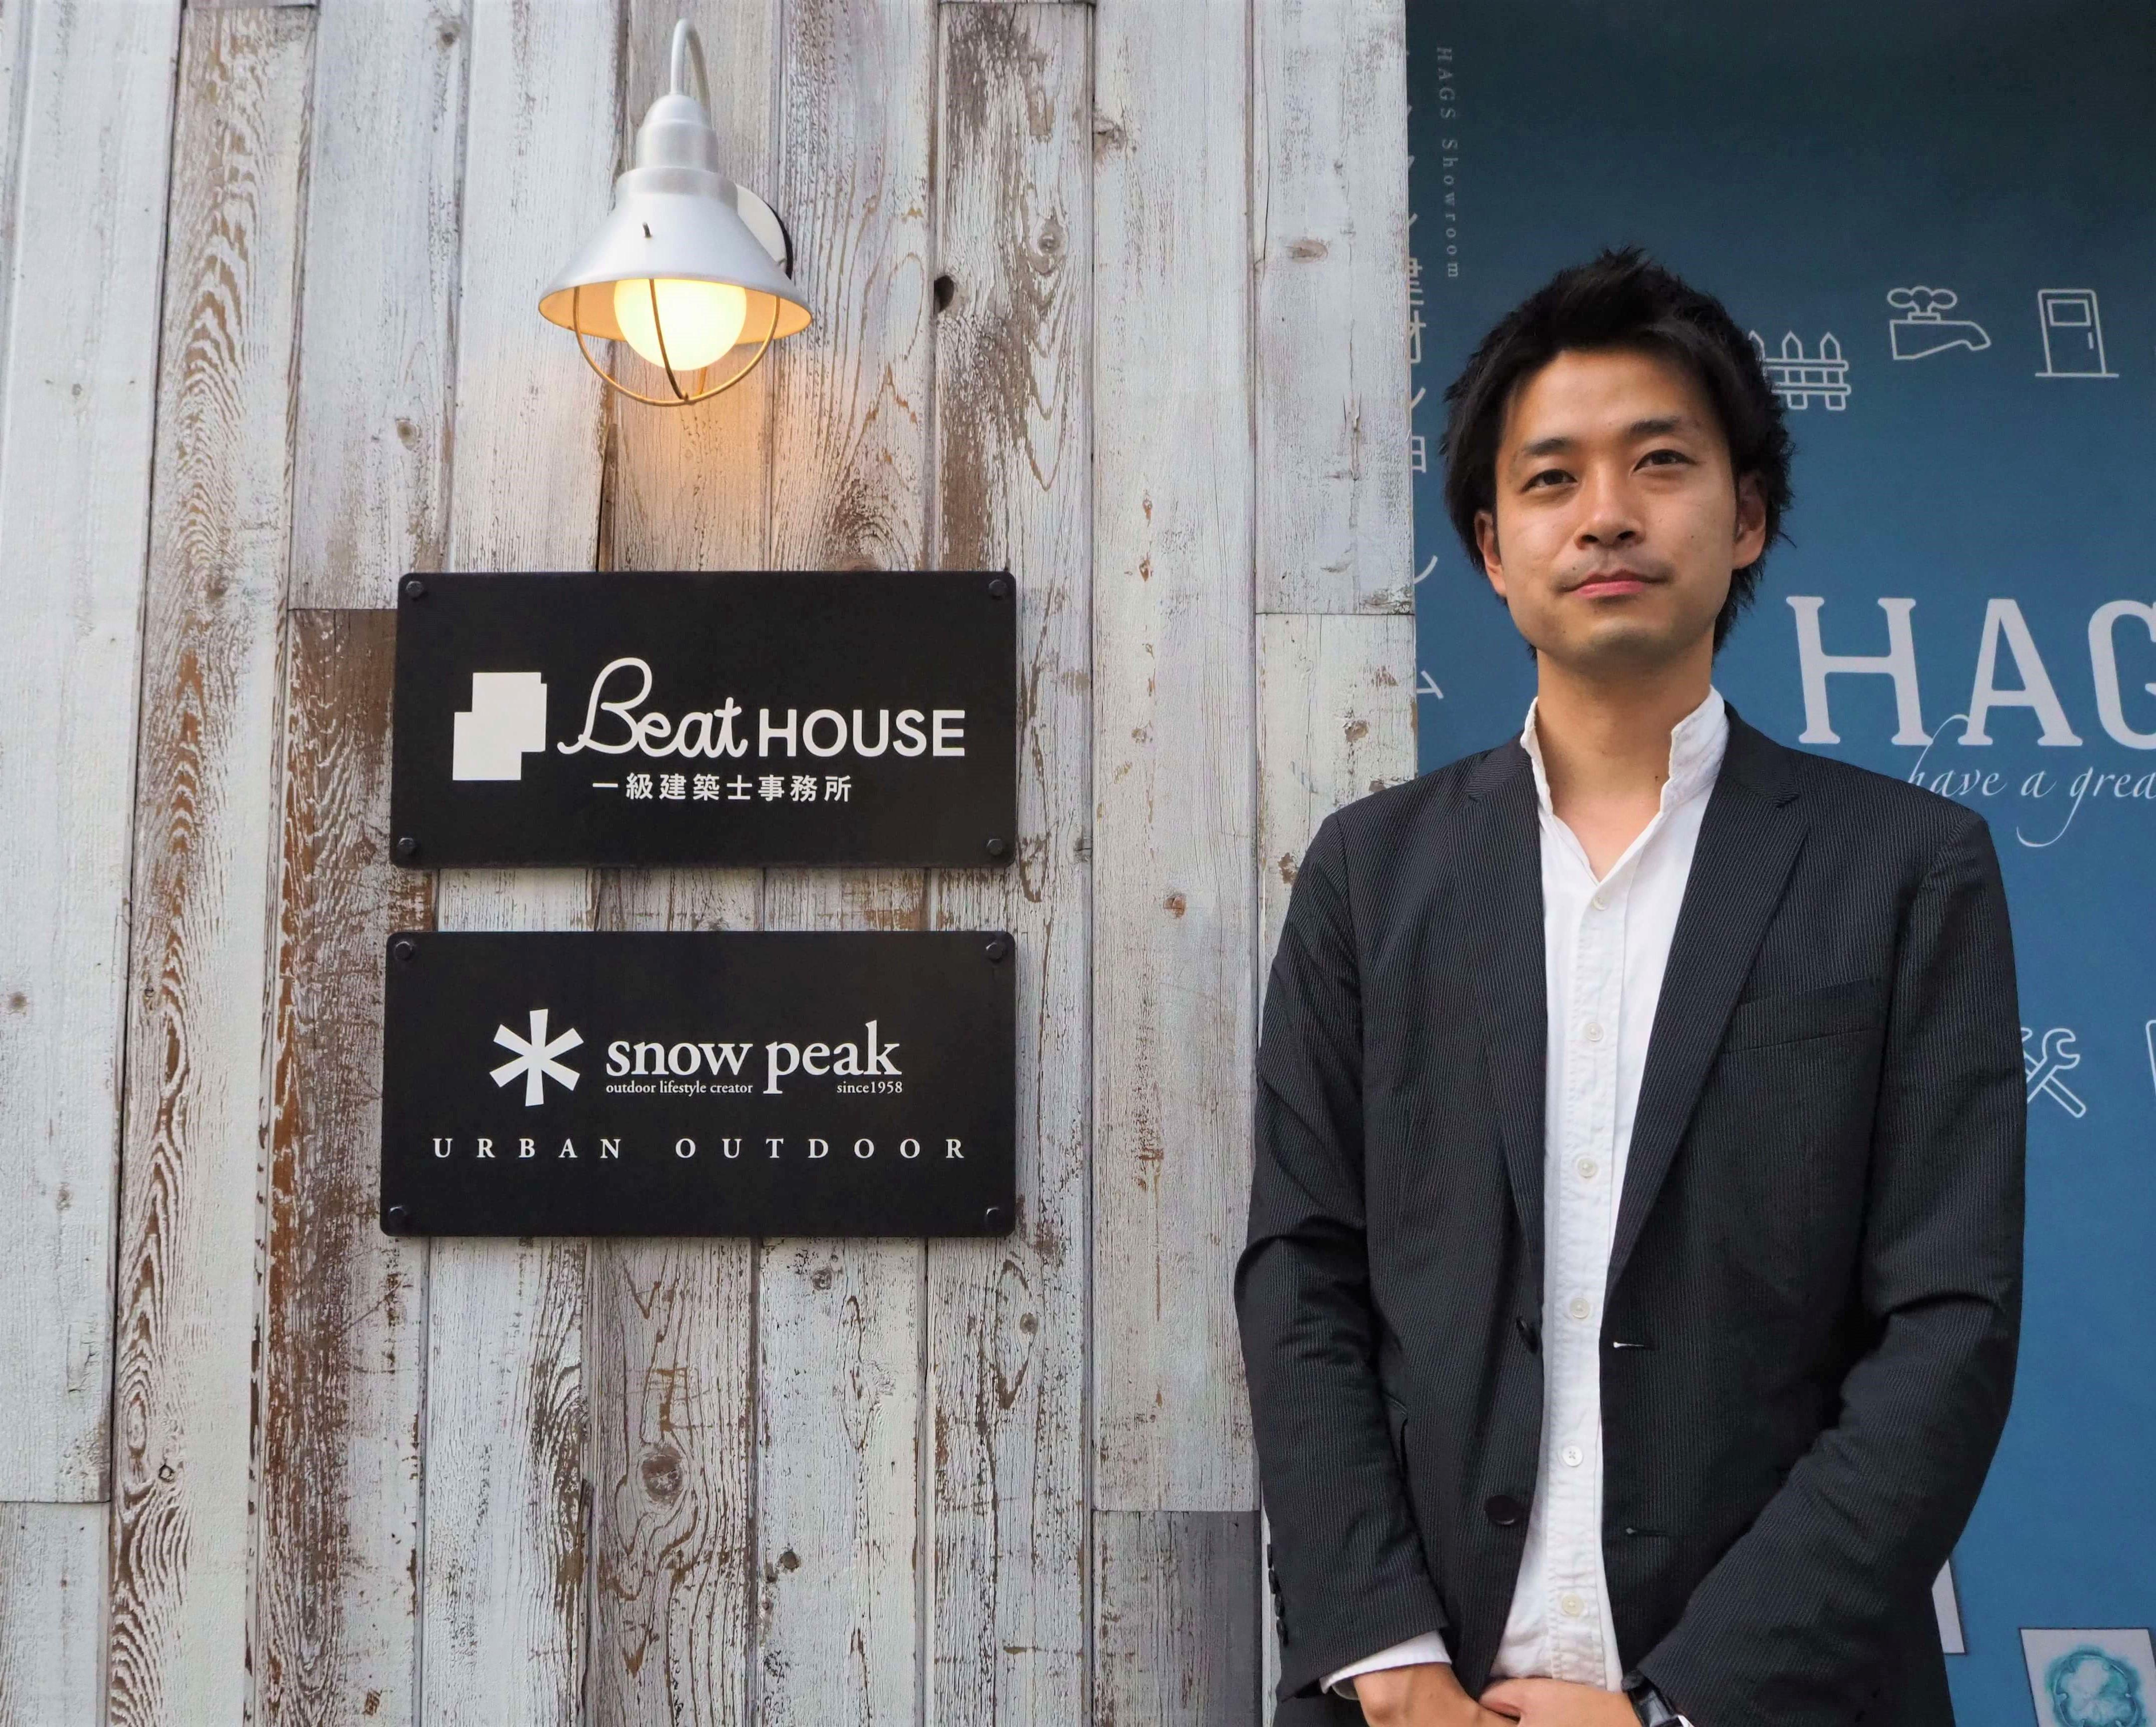 BeatHouse リノベ不動産インタビュー